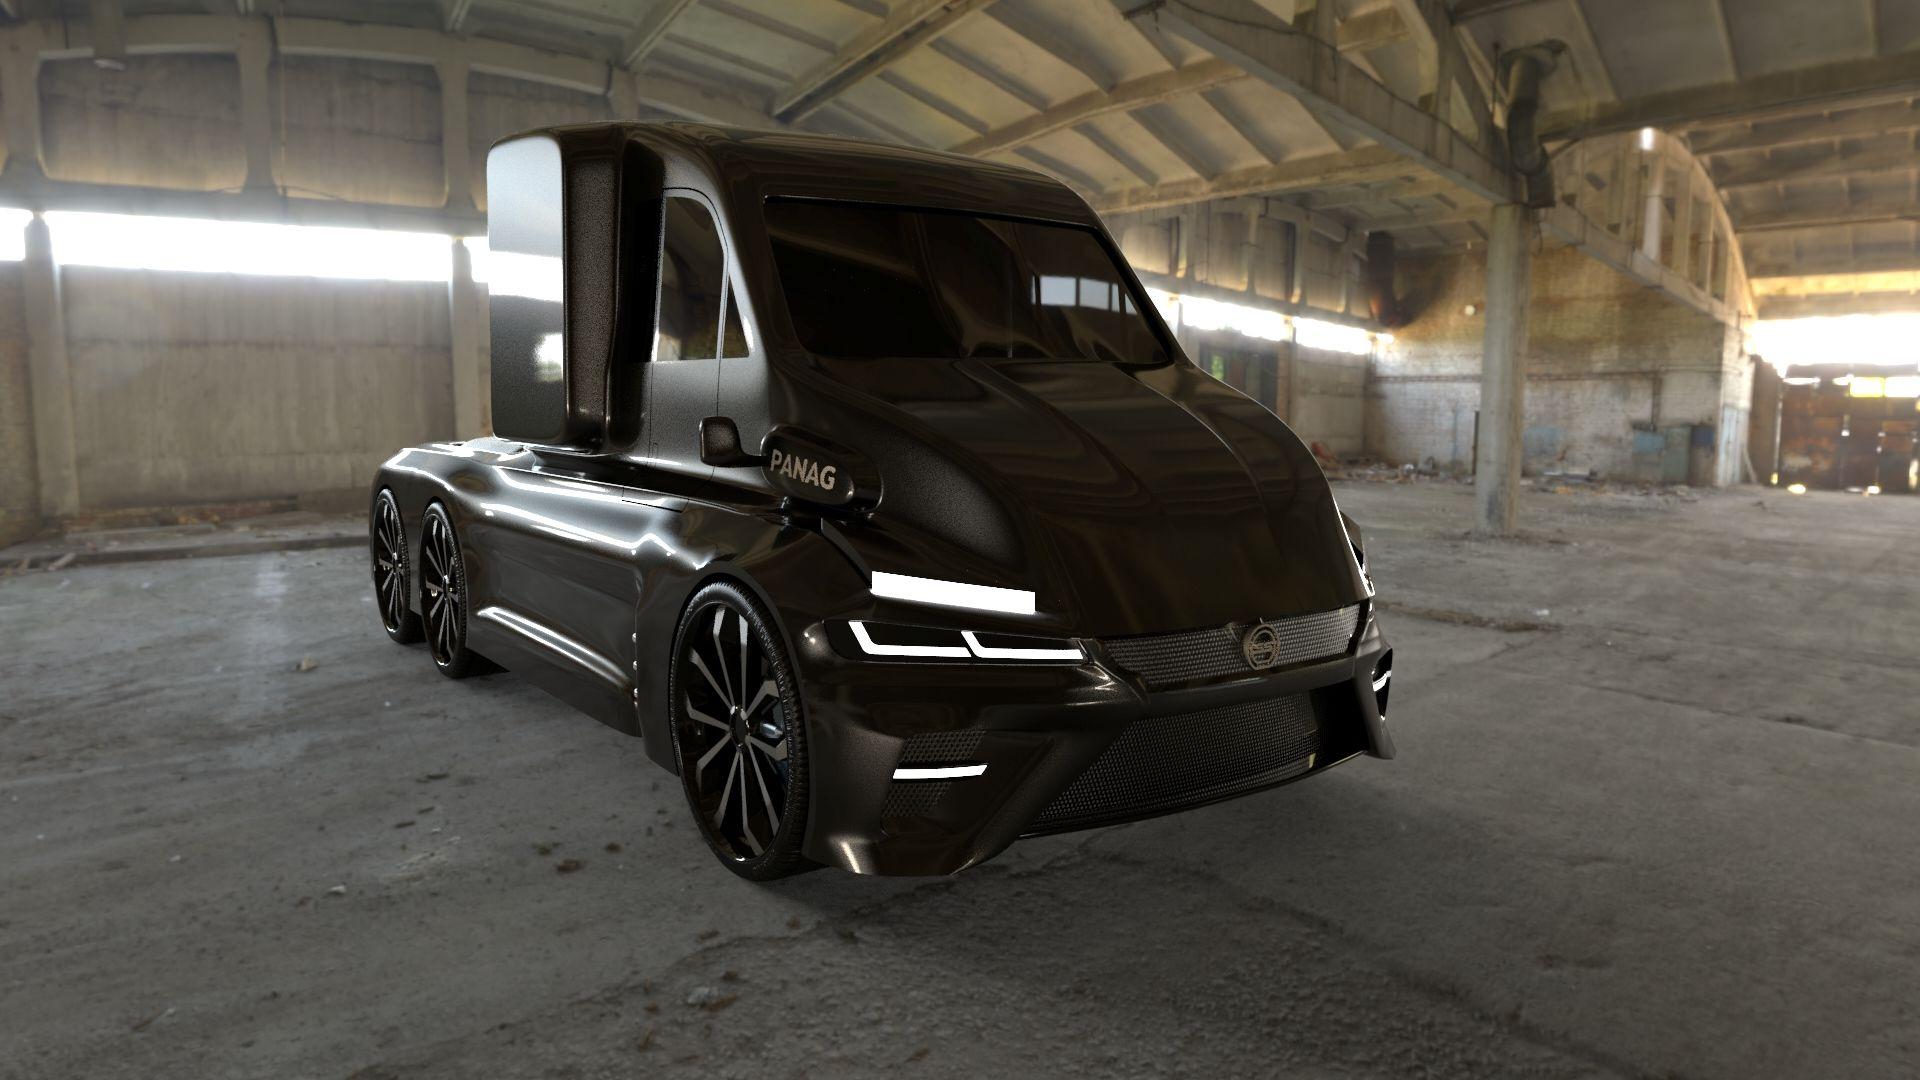 Truck5-3500-3500